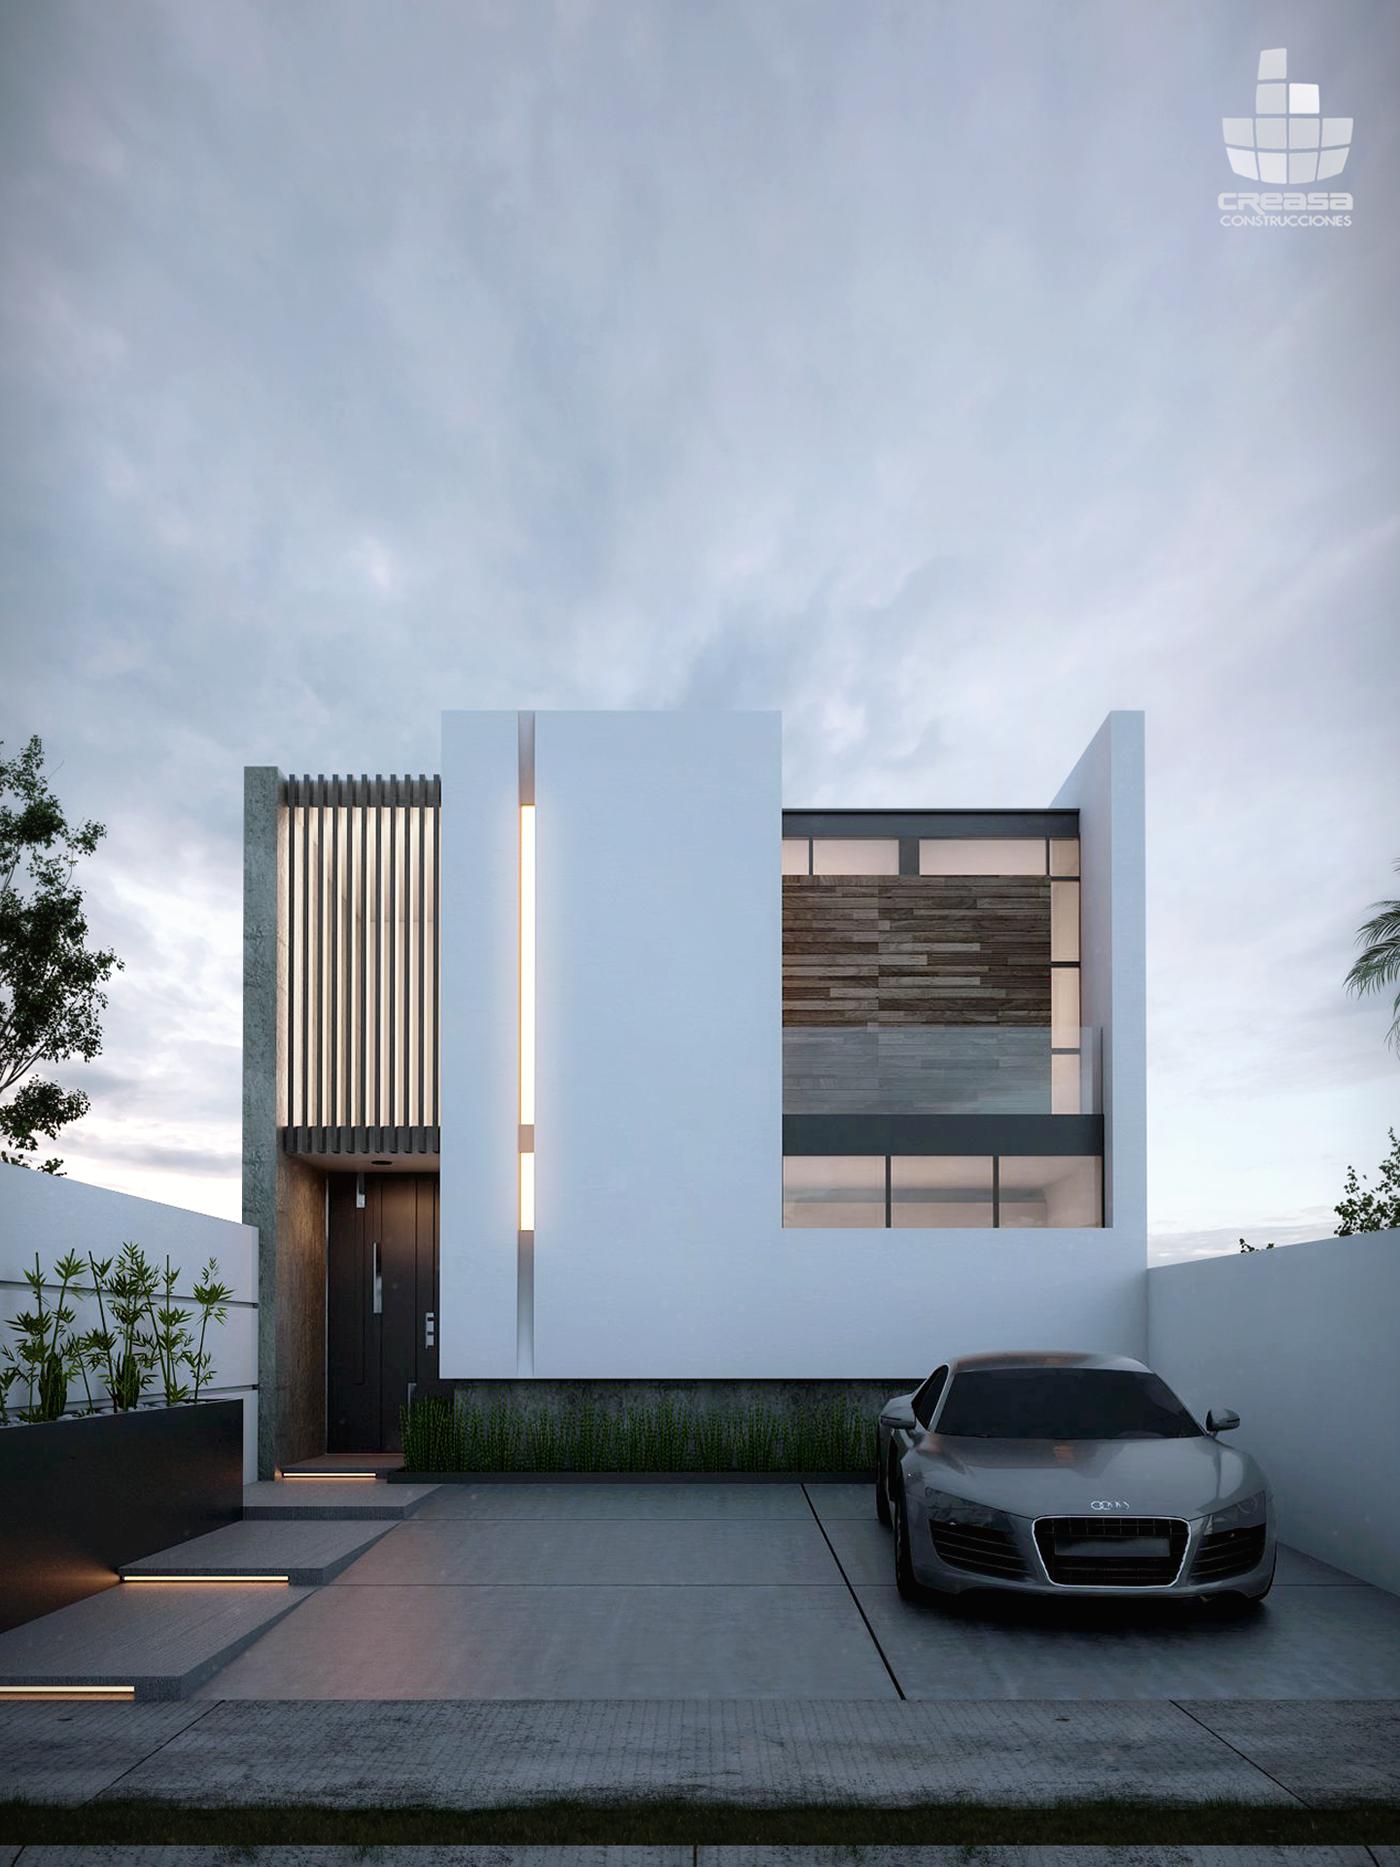 Casas en colima m xico v renderings modern homes in for Planos de casas minimalistas modernas